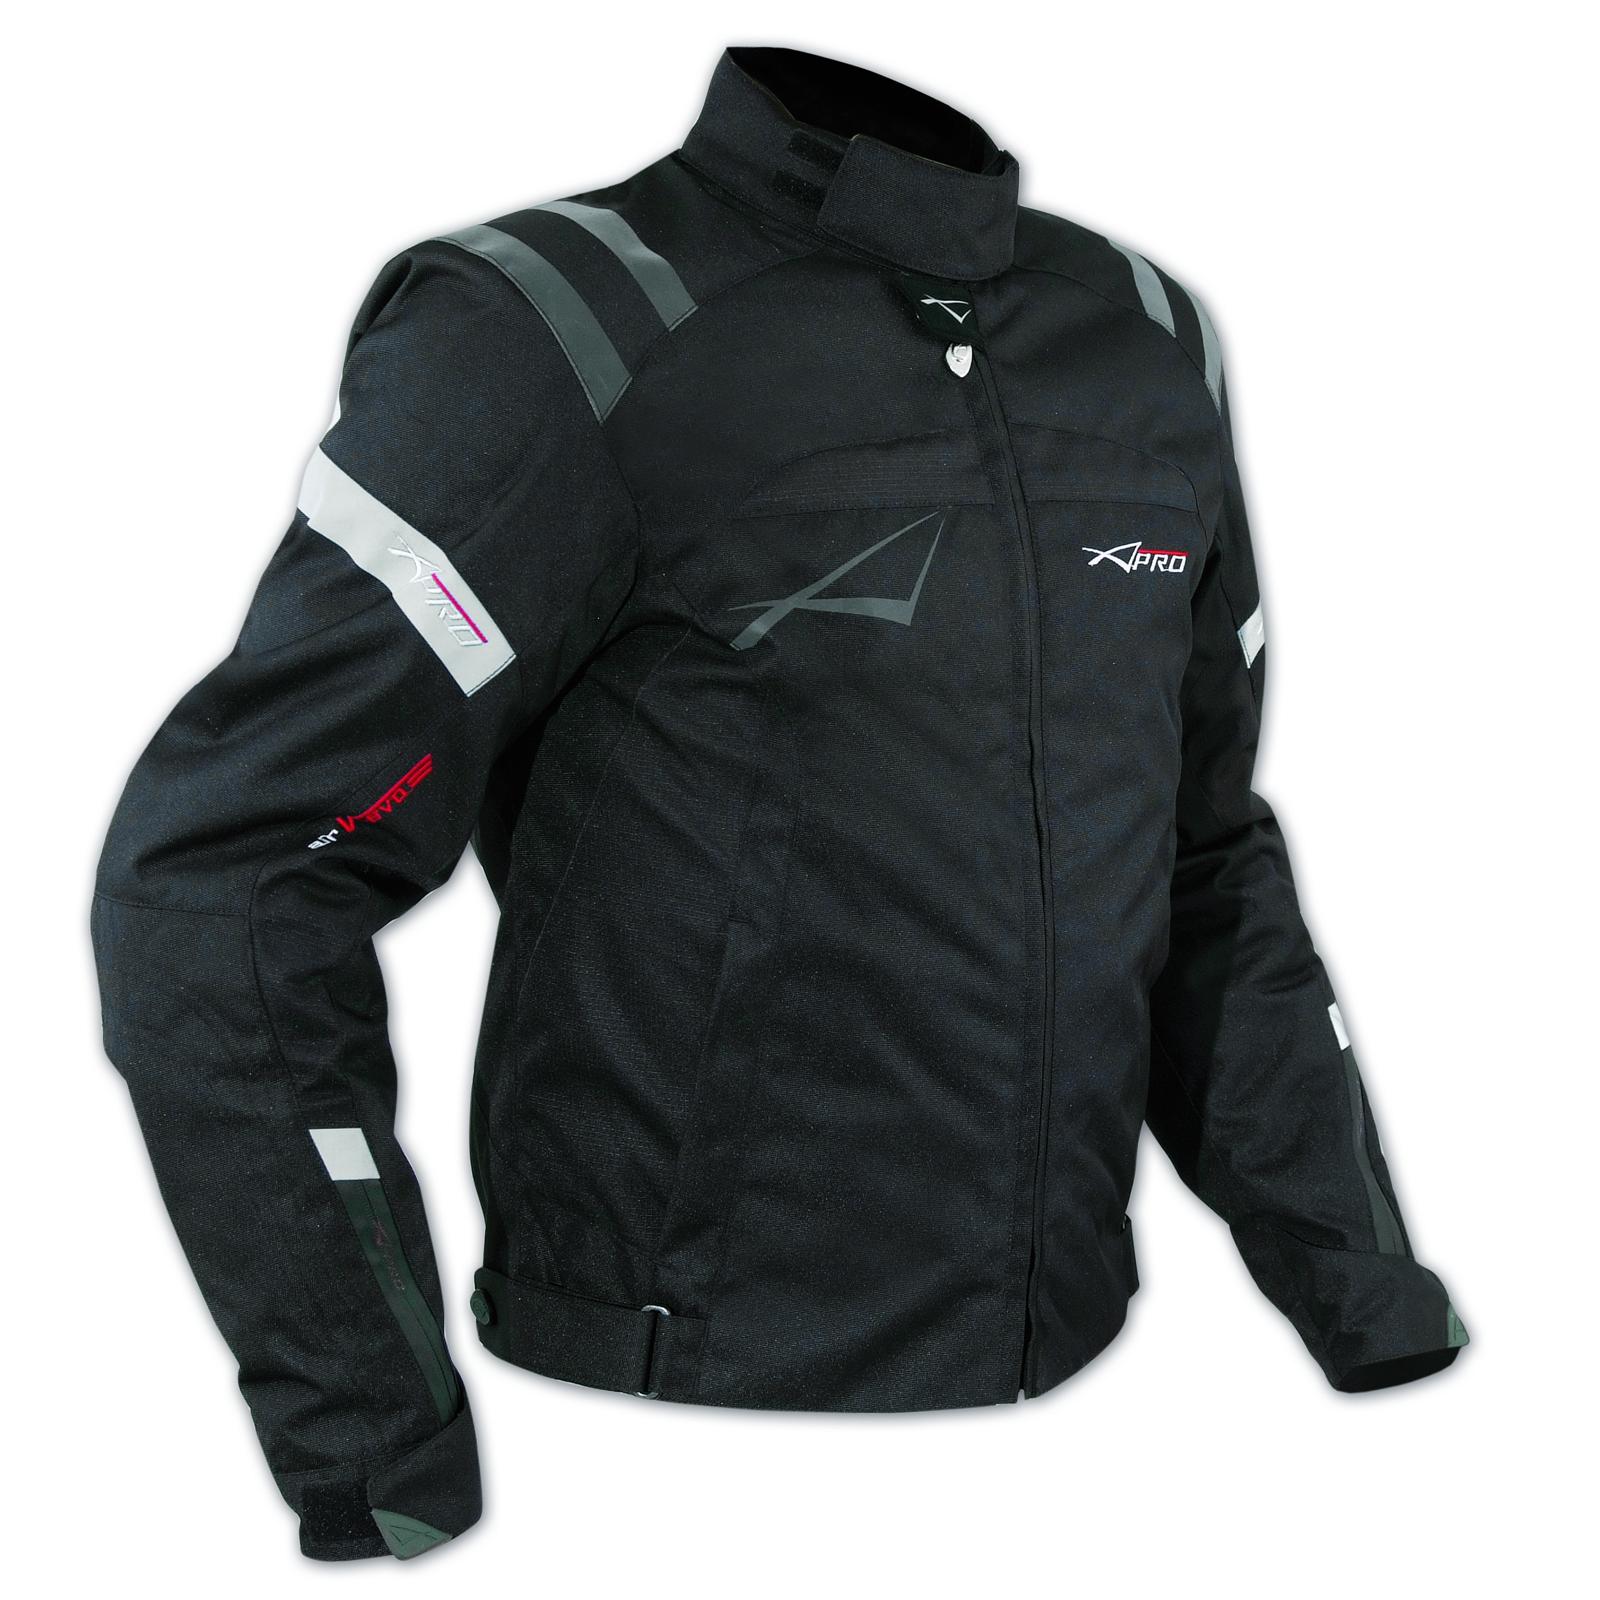 blouson textile motard sport protections doublure hiver moto veste touring ebay. Black Bedroom Furniture Sets. Home Design Ideas